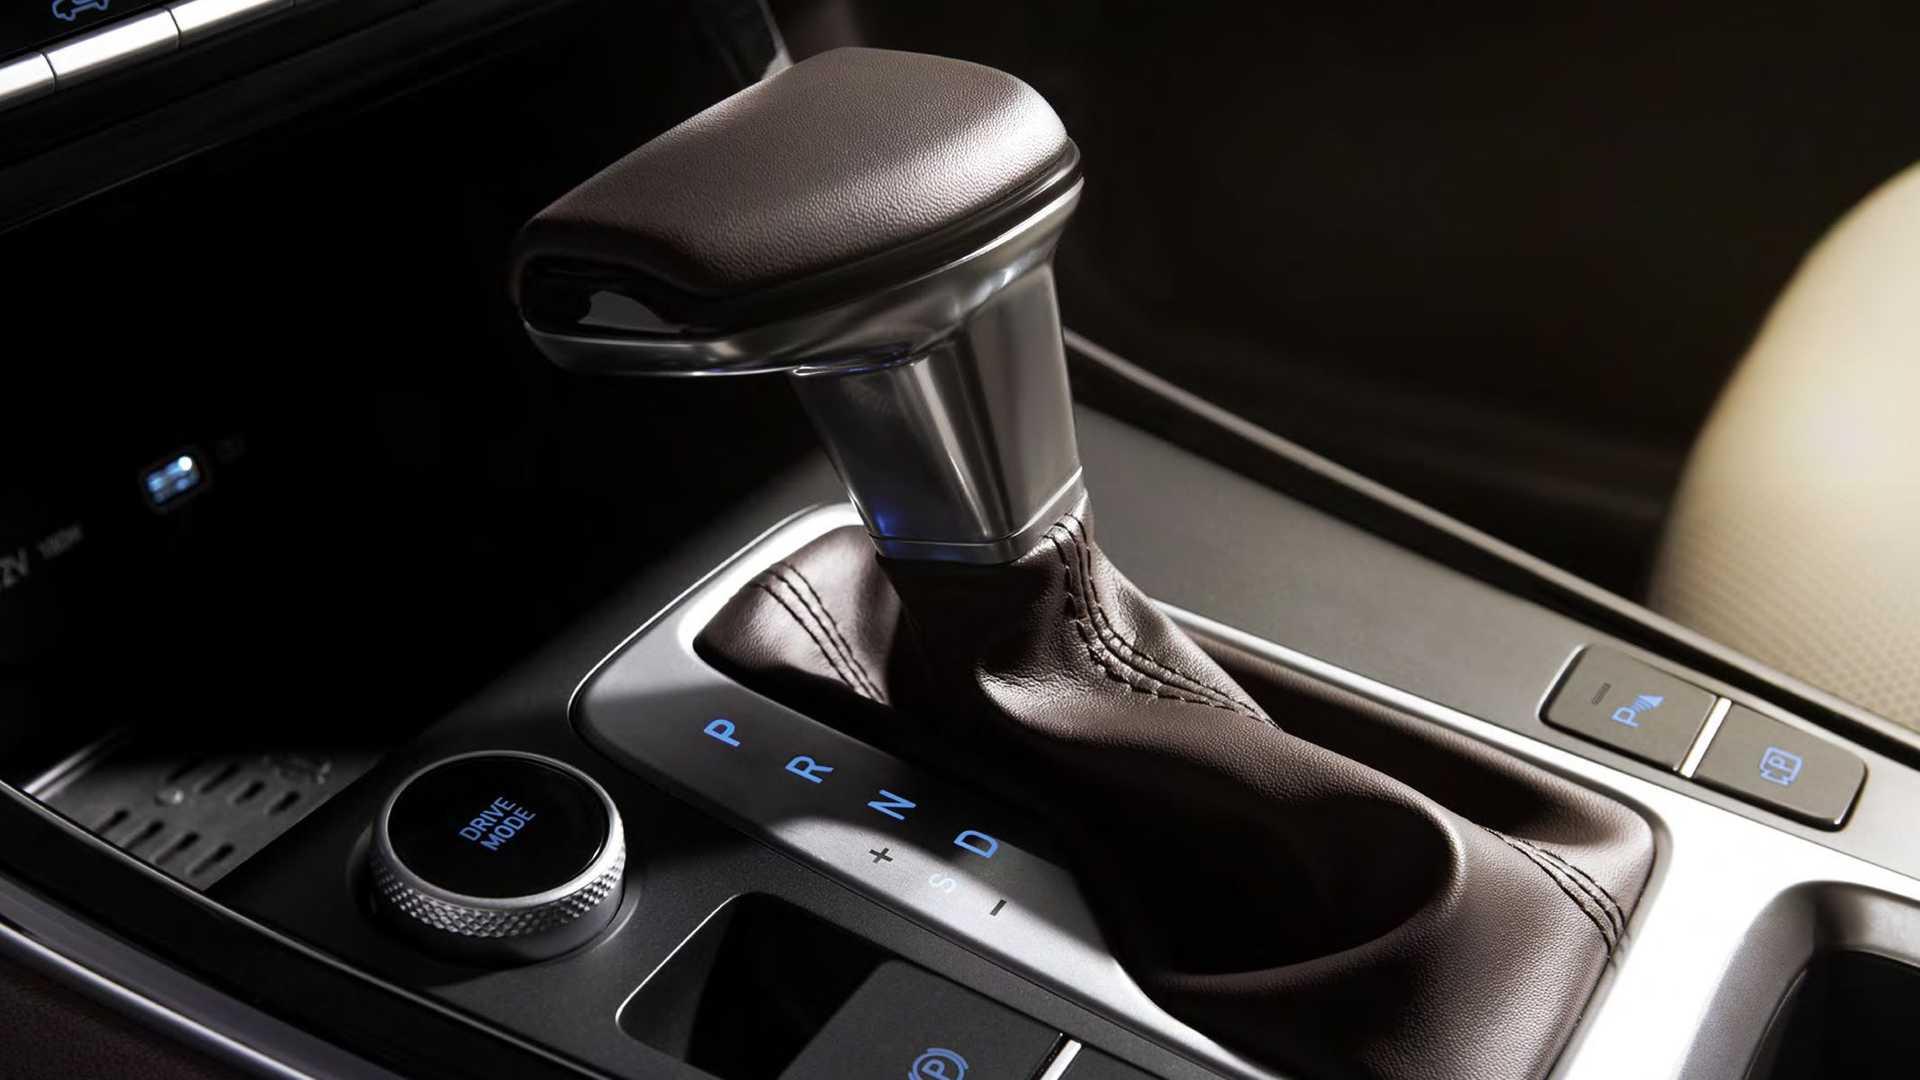 Caja automática Nuevo Hyundai Creta 2022